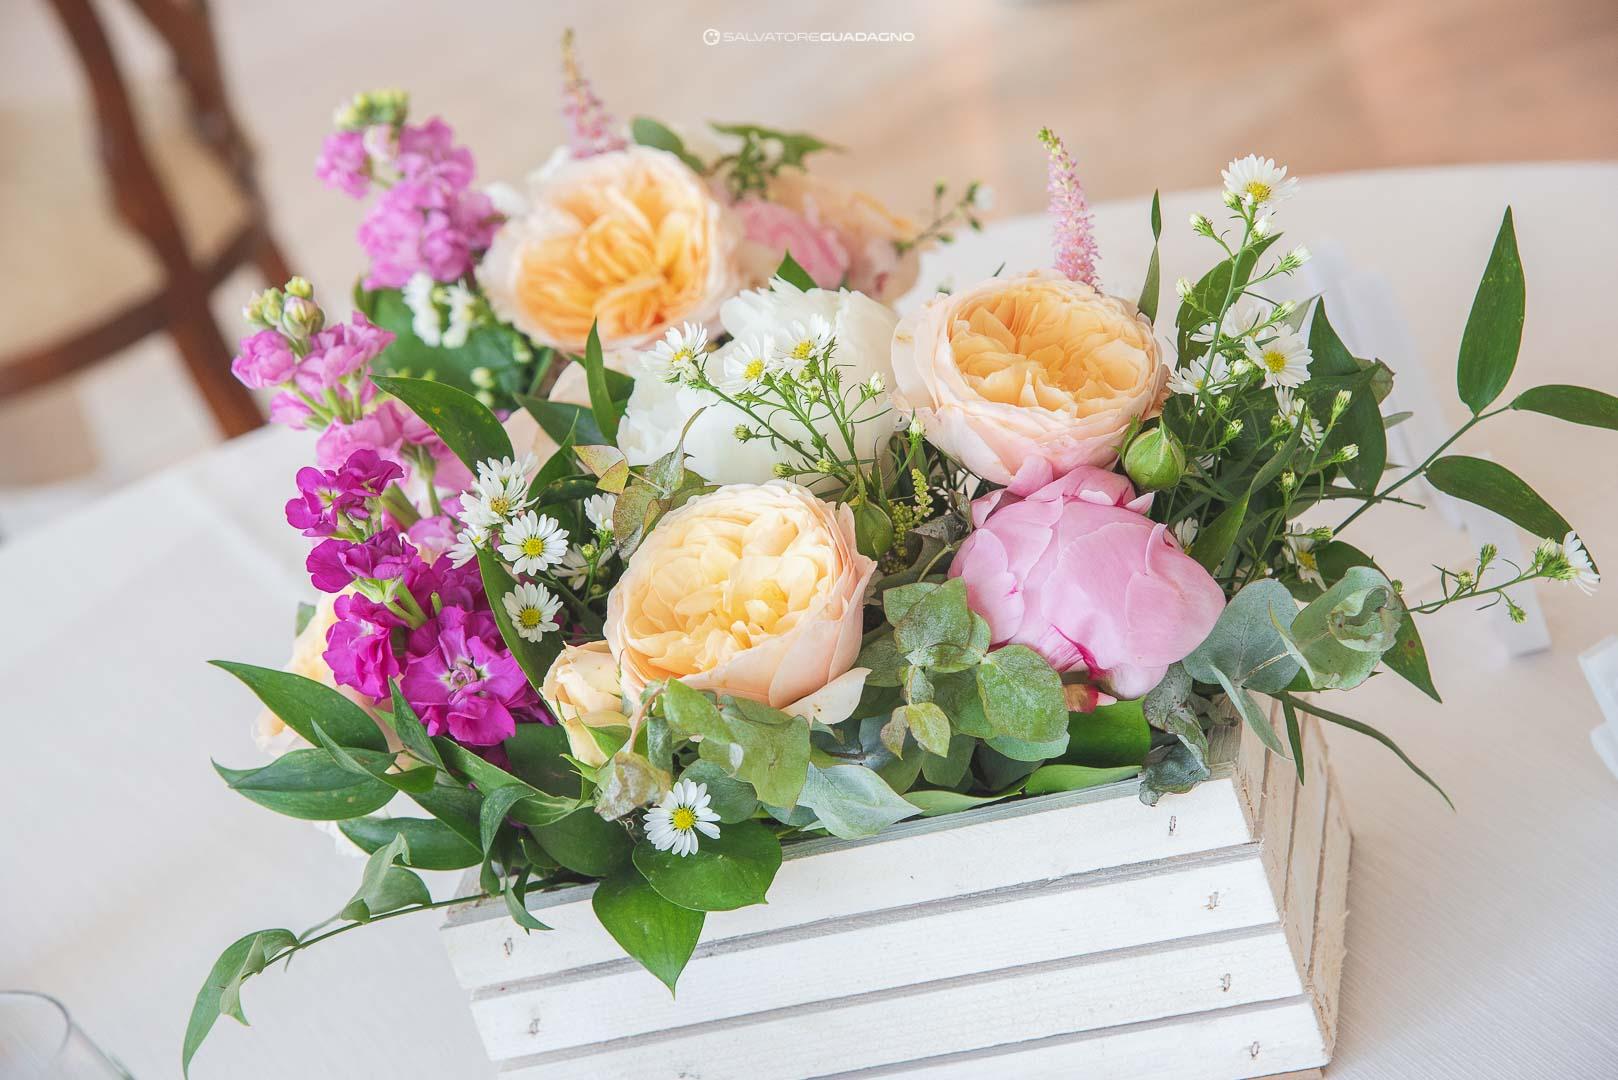 fotografo-fiori-matrimonio-costiera-amalfitana